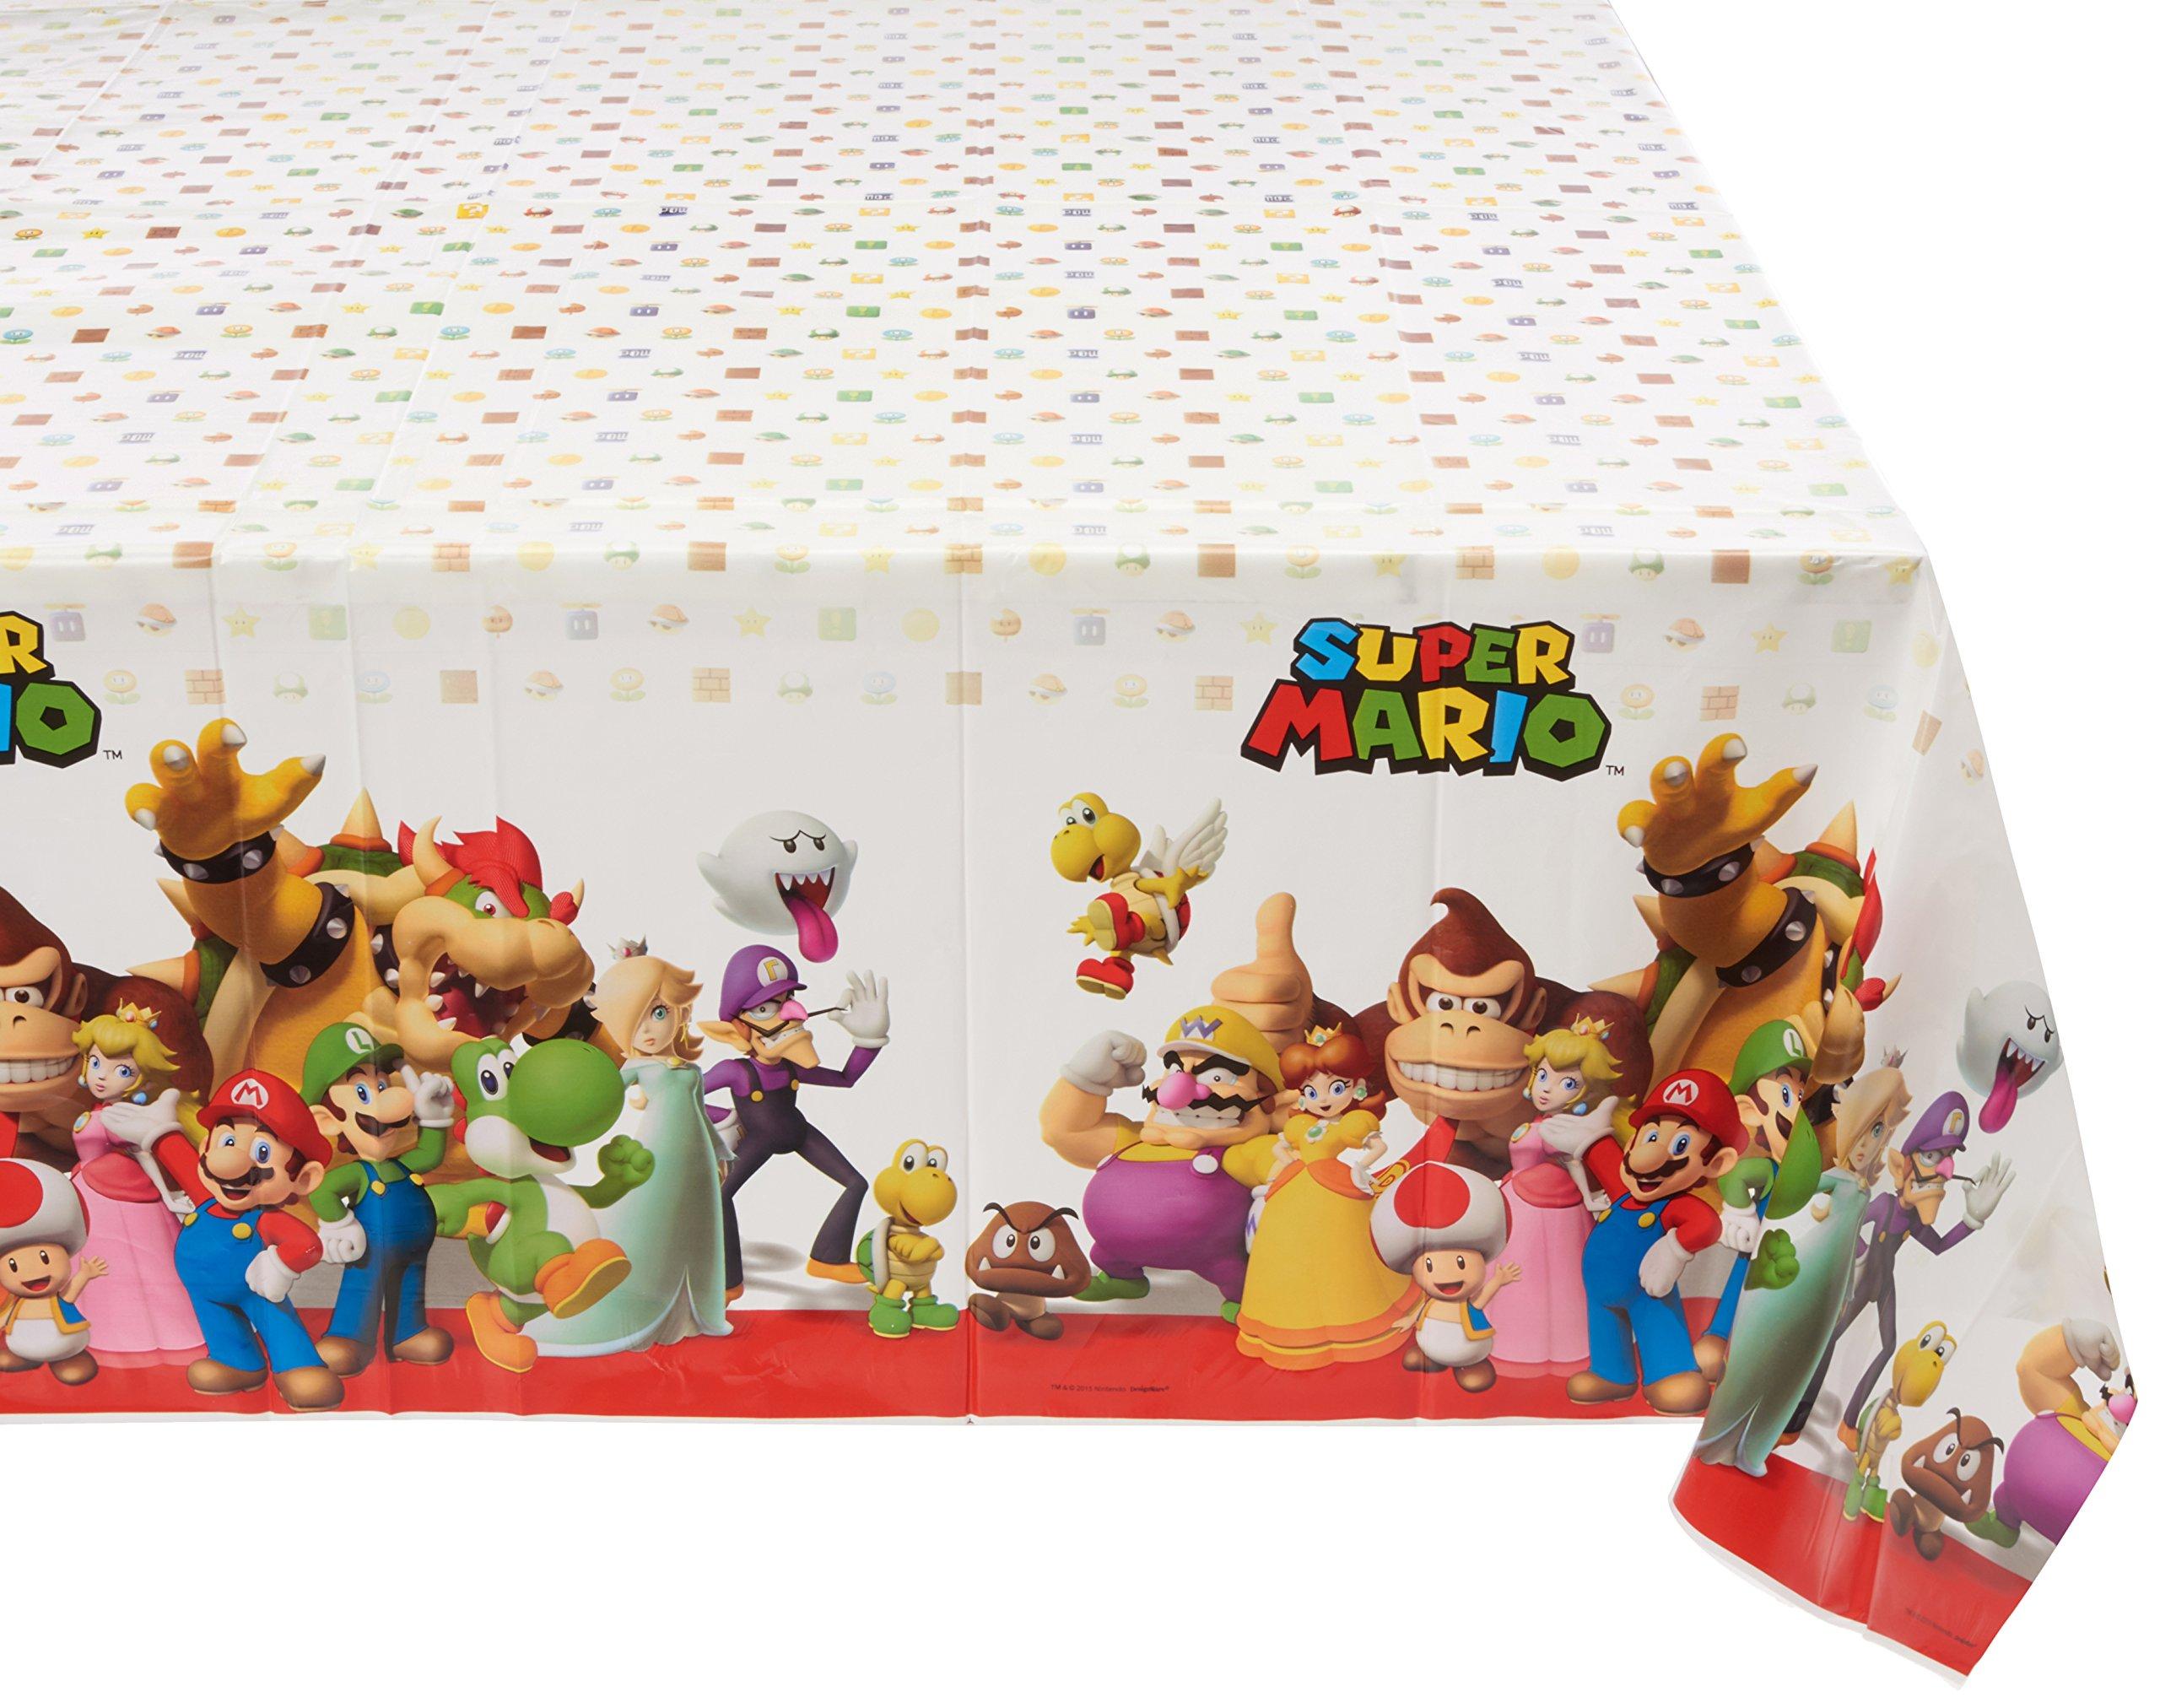 Super Mario Brothers Plastic Table